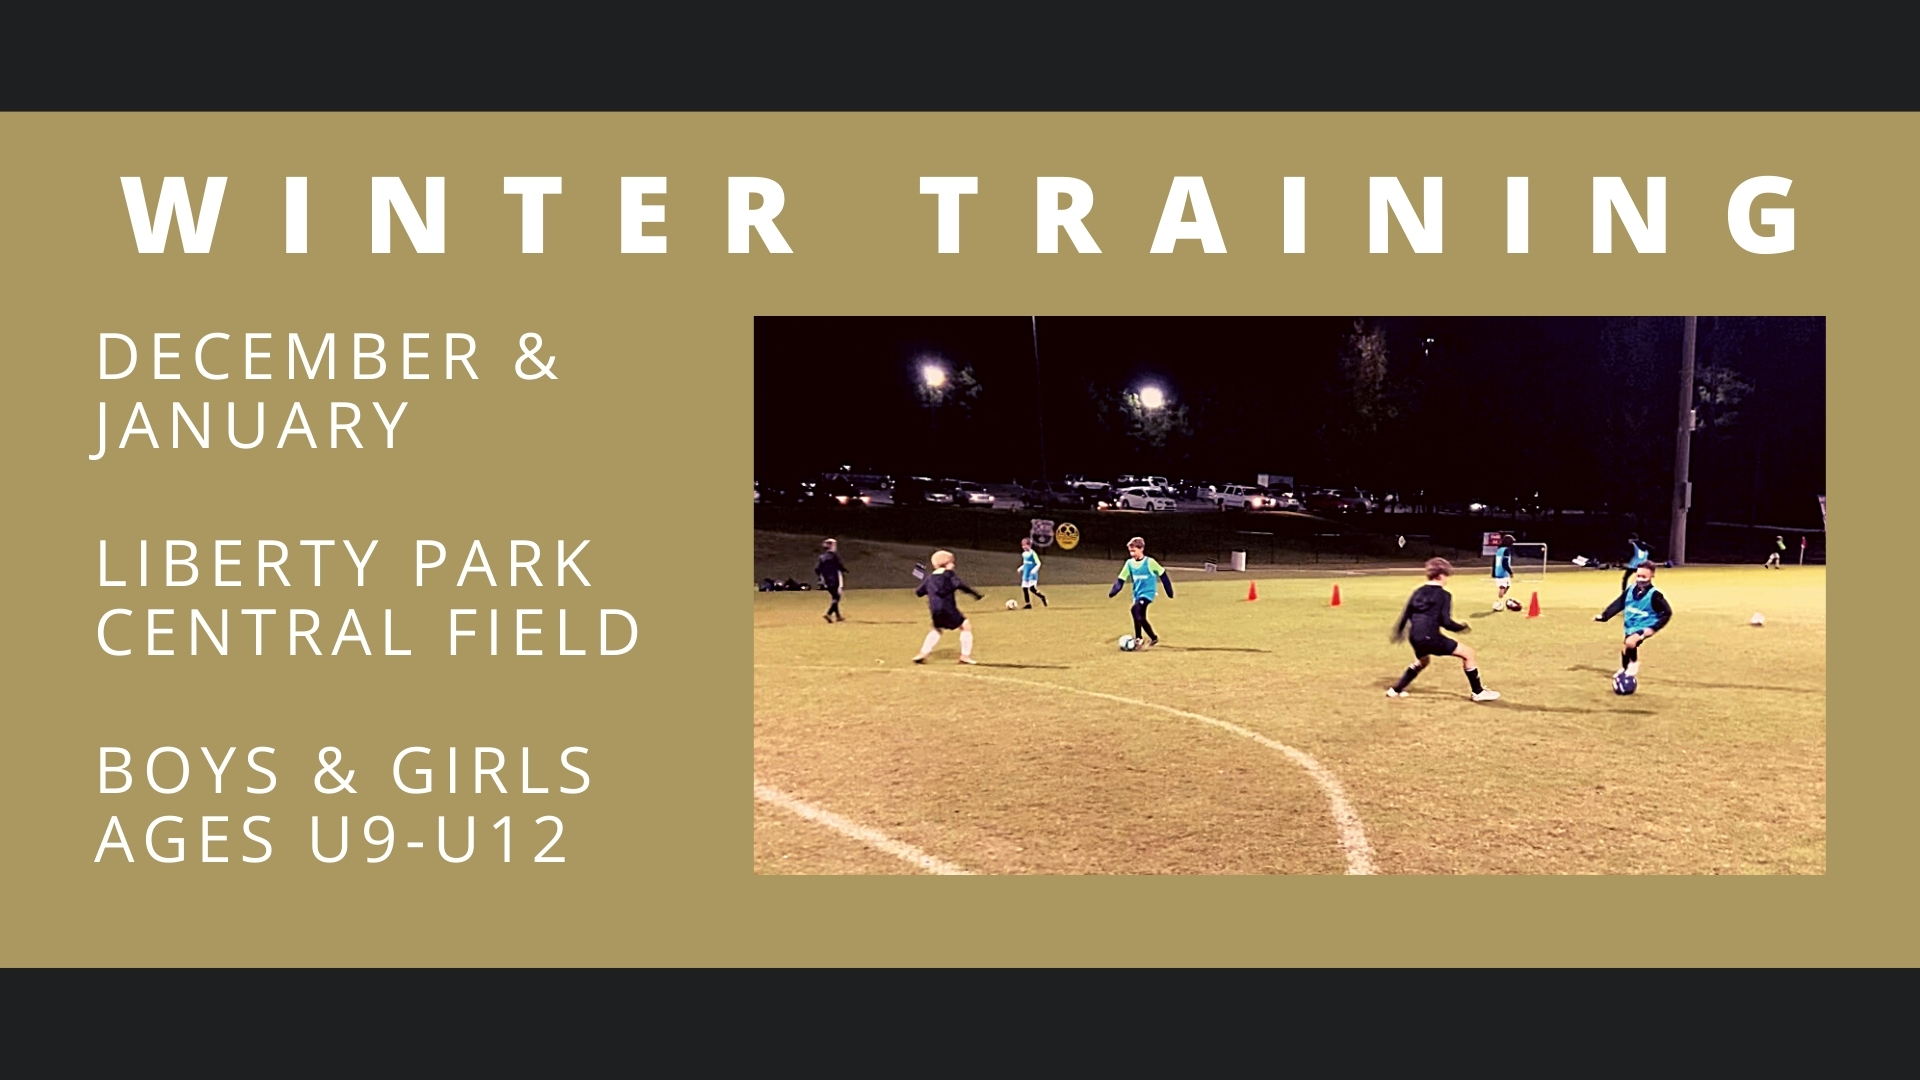 1920x1080 Winter Training 2